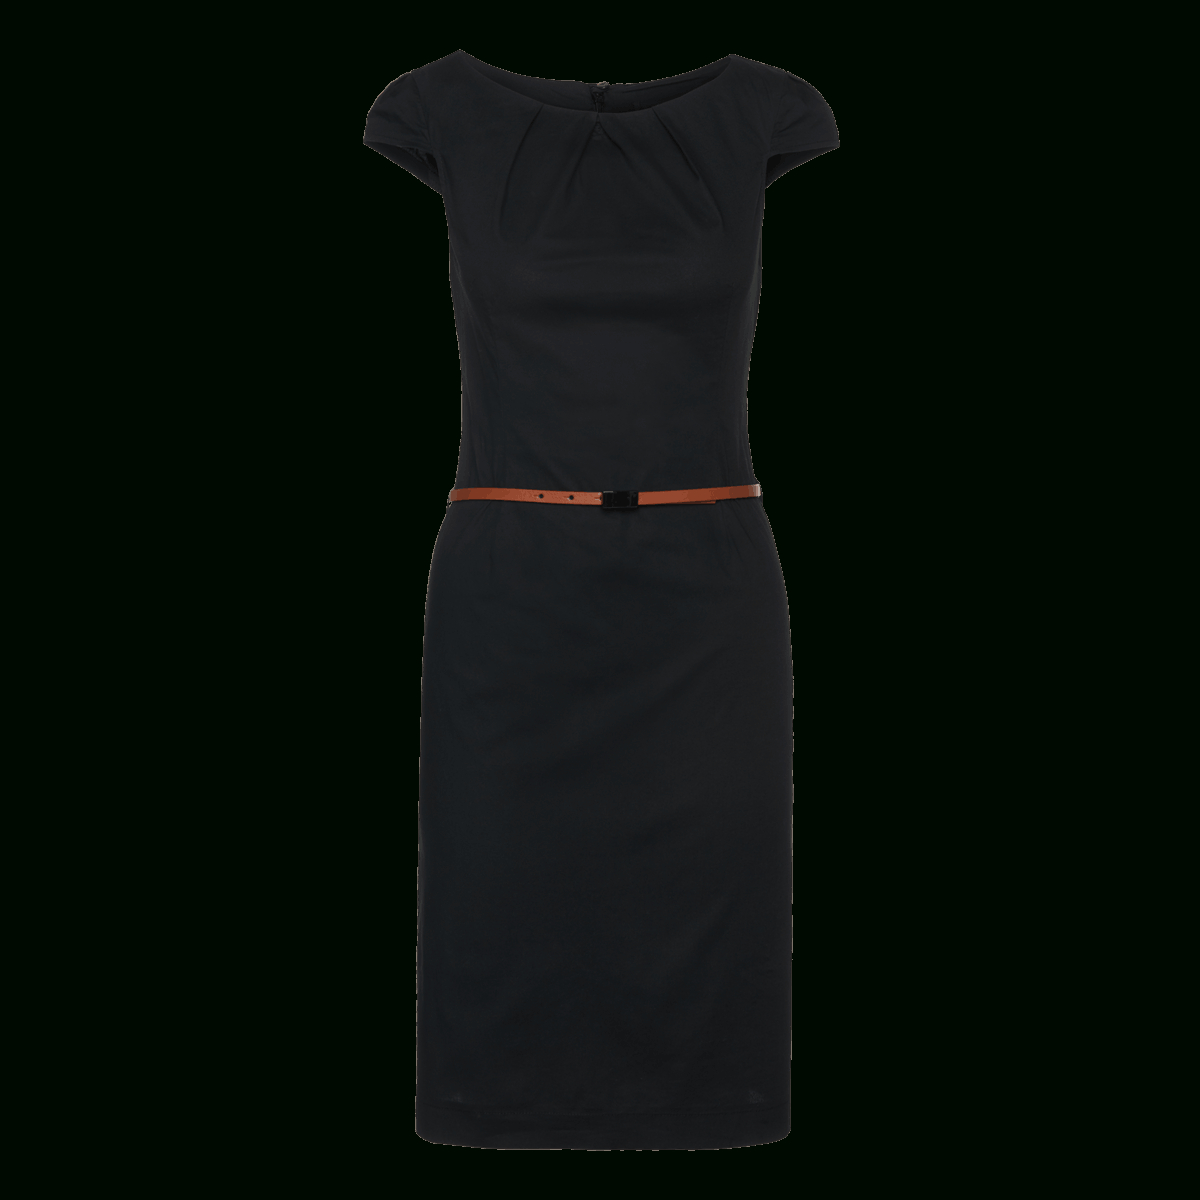 13 Genial Zero Abendkleid SpezialgebietAbend Top Zero Abendkleid Galerie